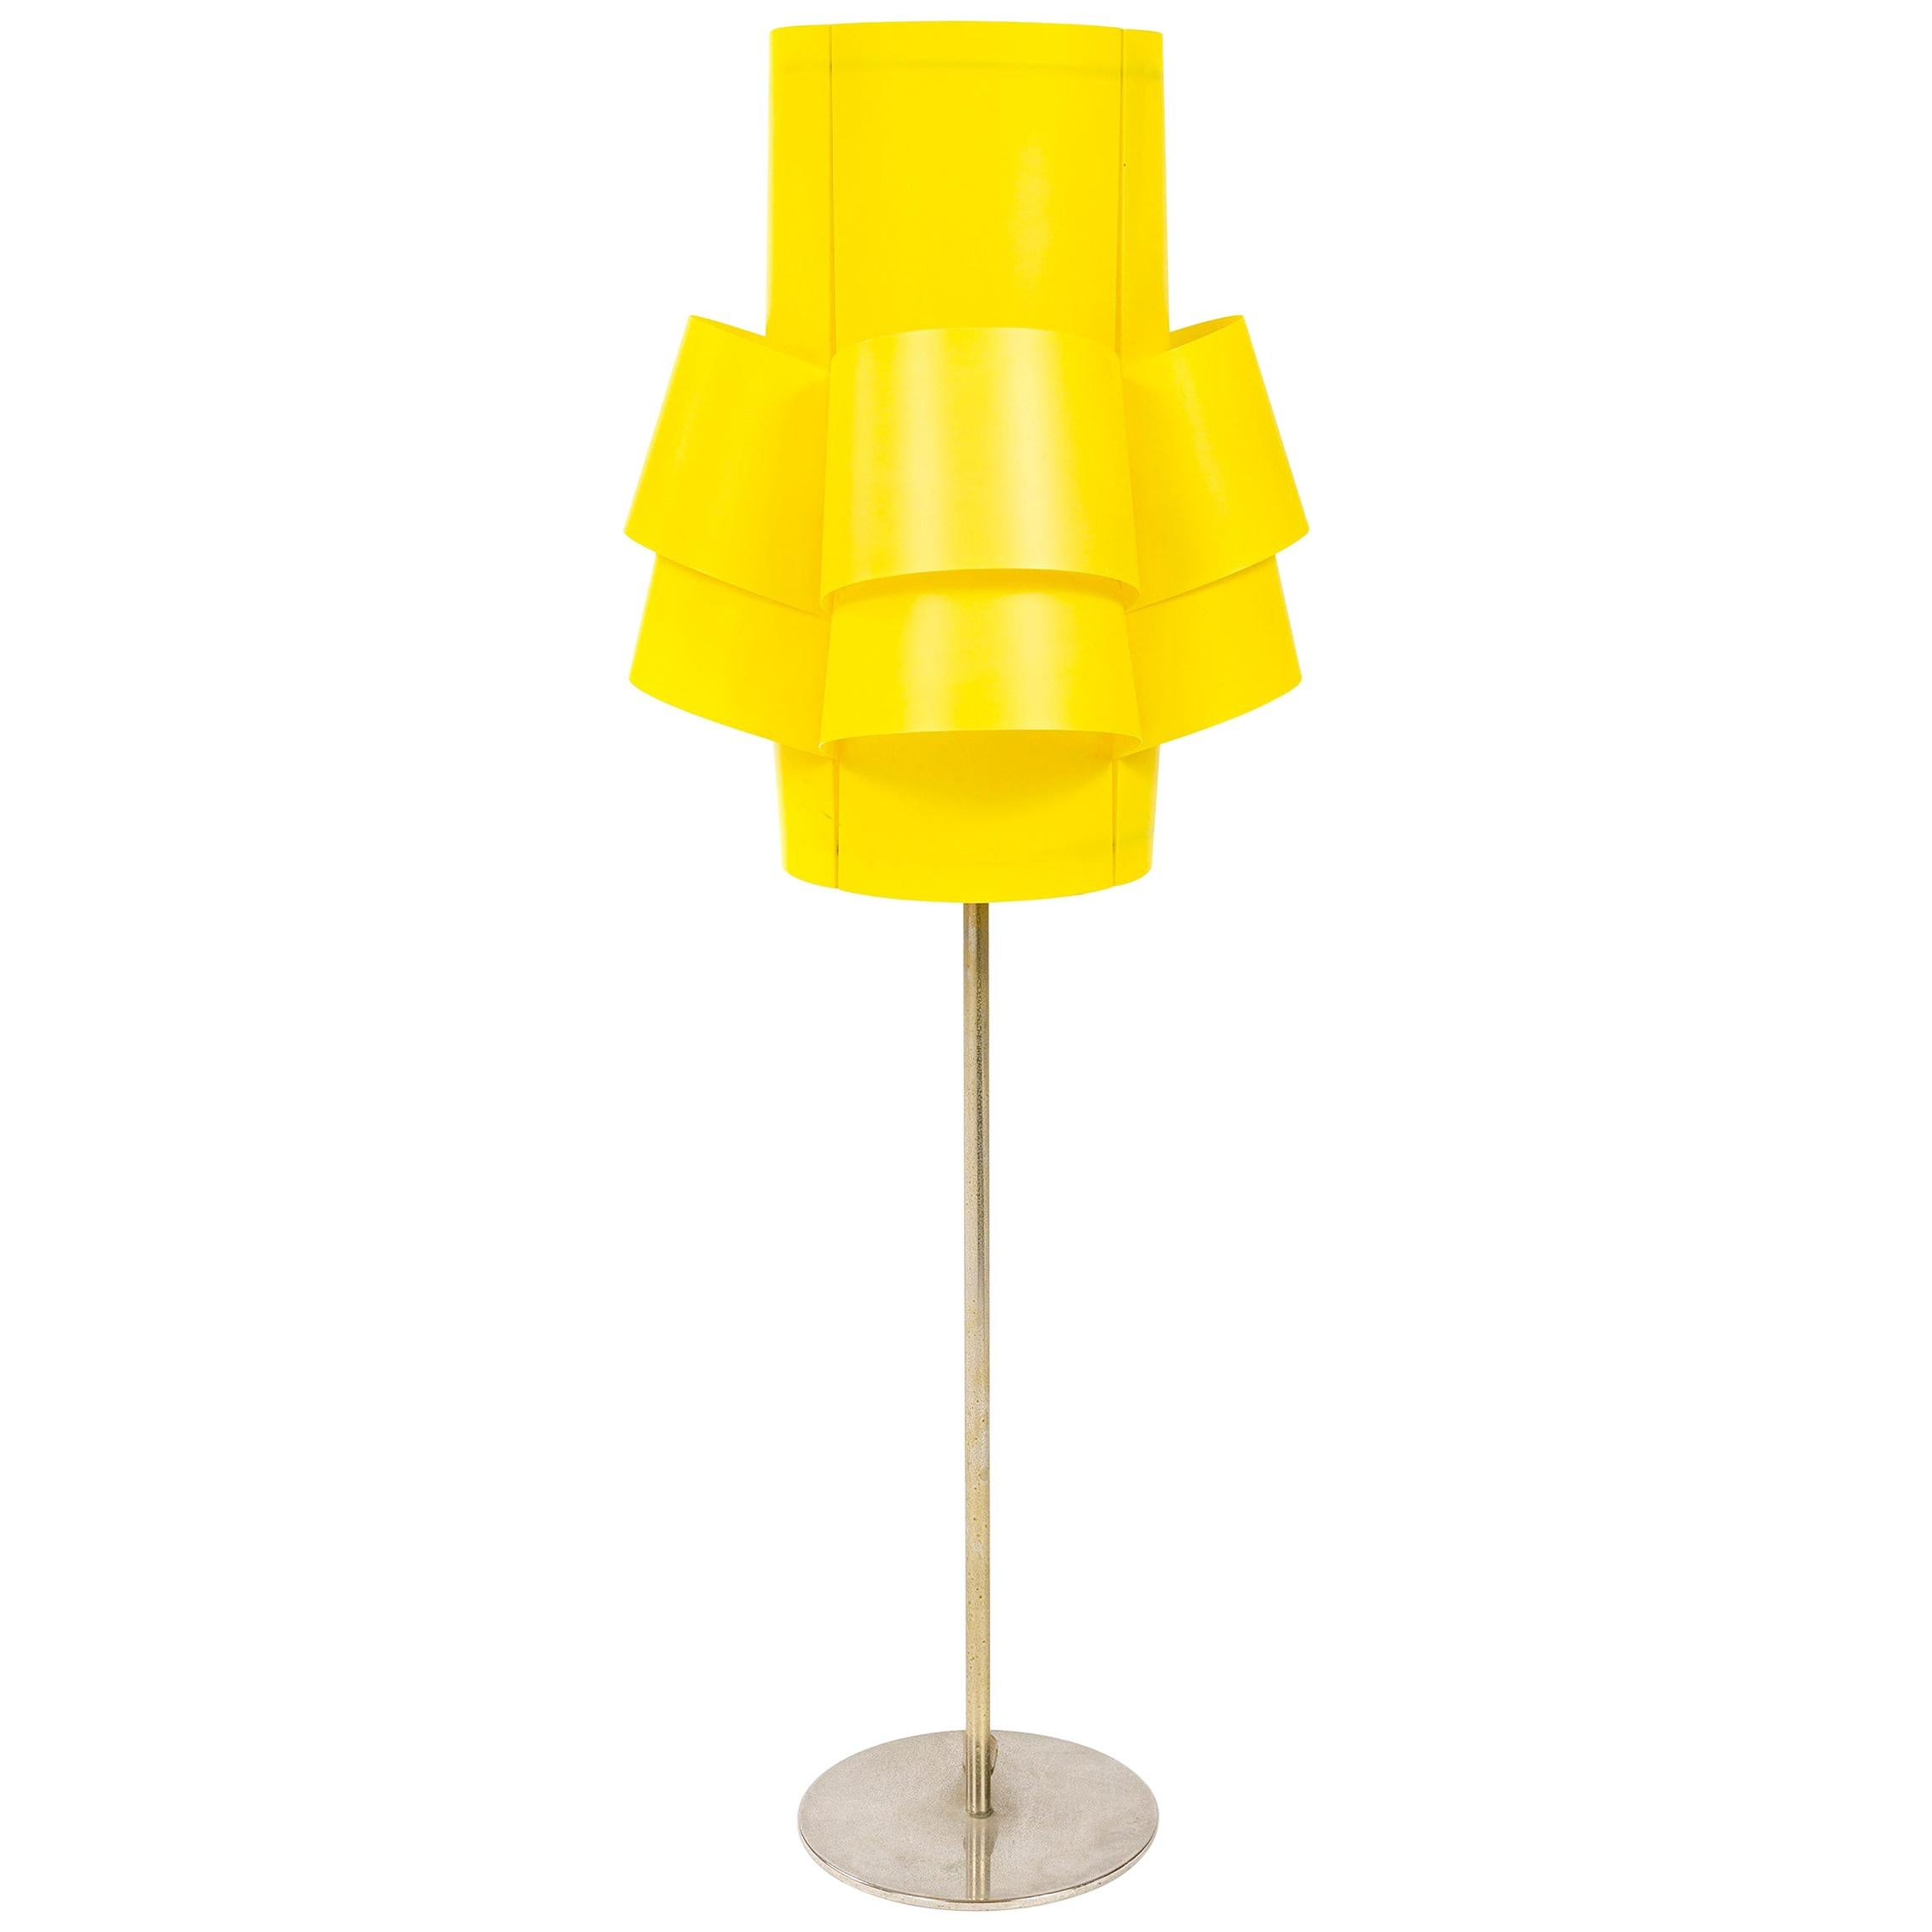 1970s Swedish Table Lamp by Torsten Orrling for Hans-Agne Jakobsson AB